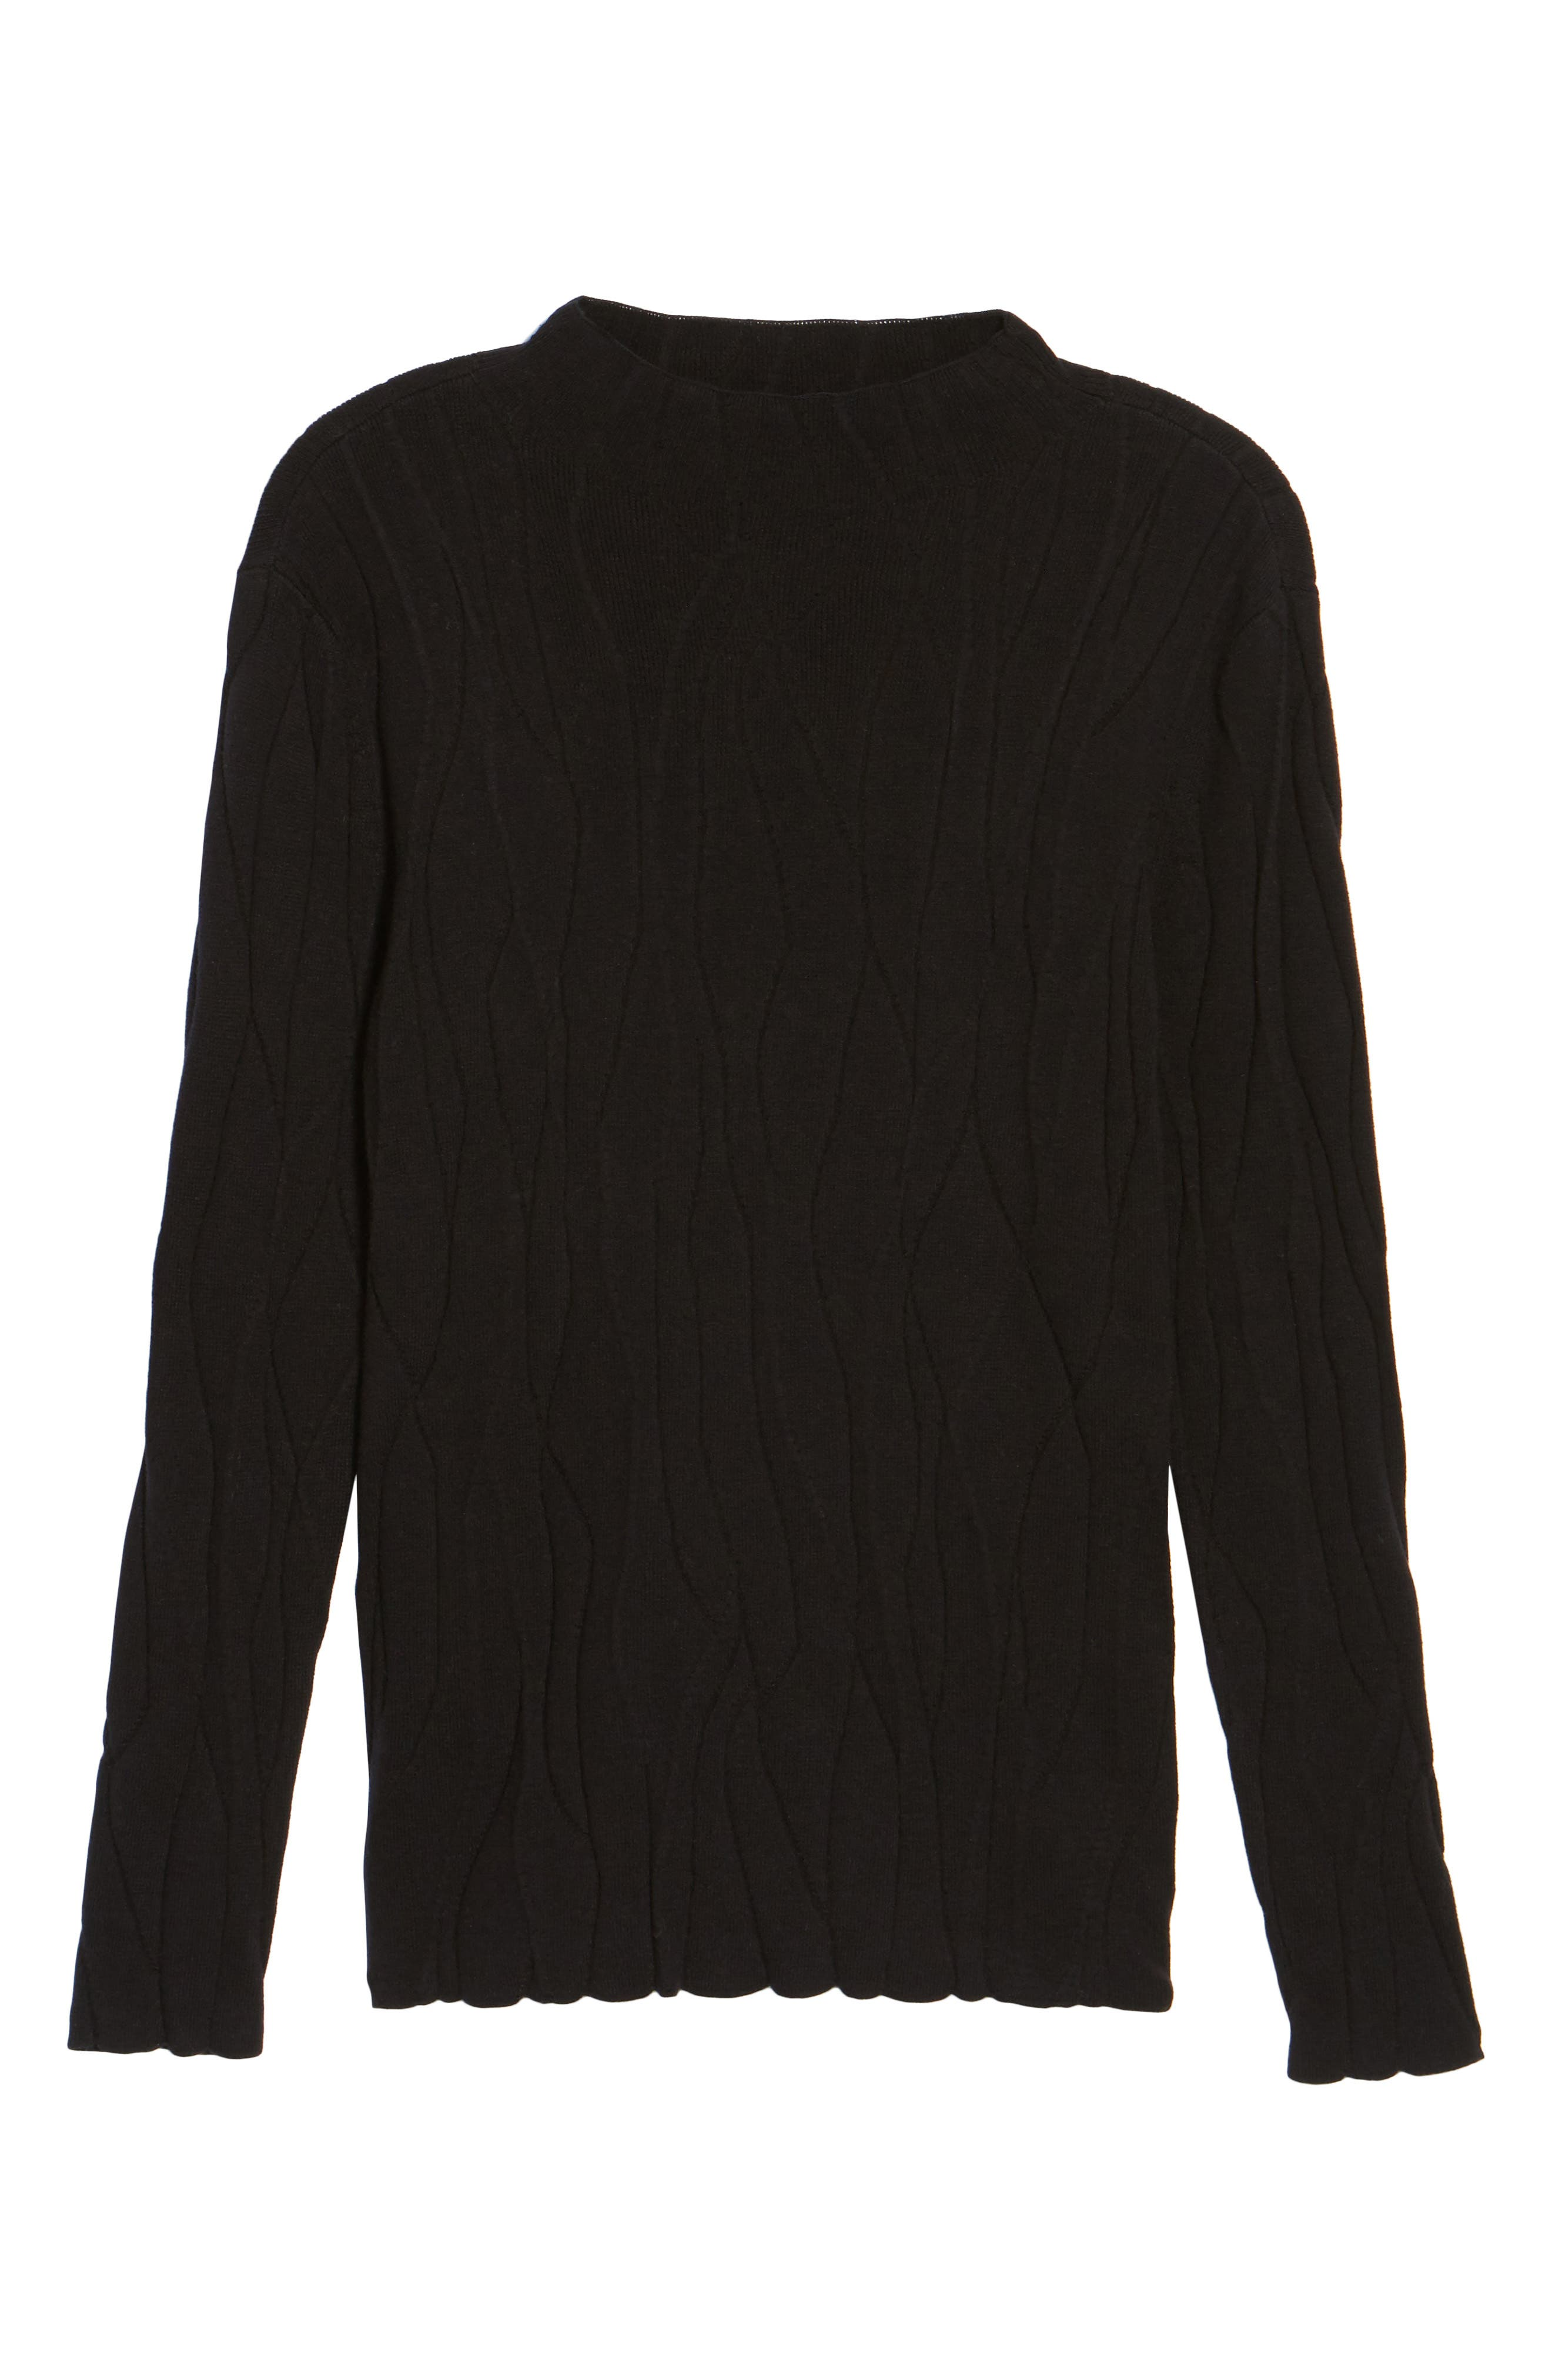 Artisanal Crackle Jacquard Sweater,                             Alternate thumbnail 6, color,                             004